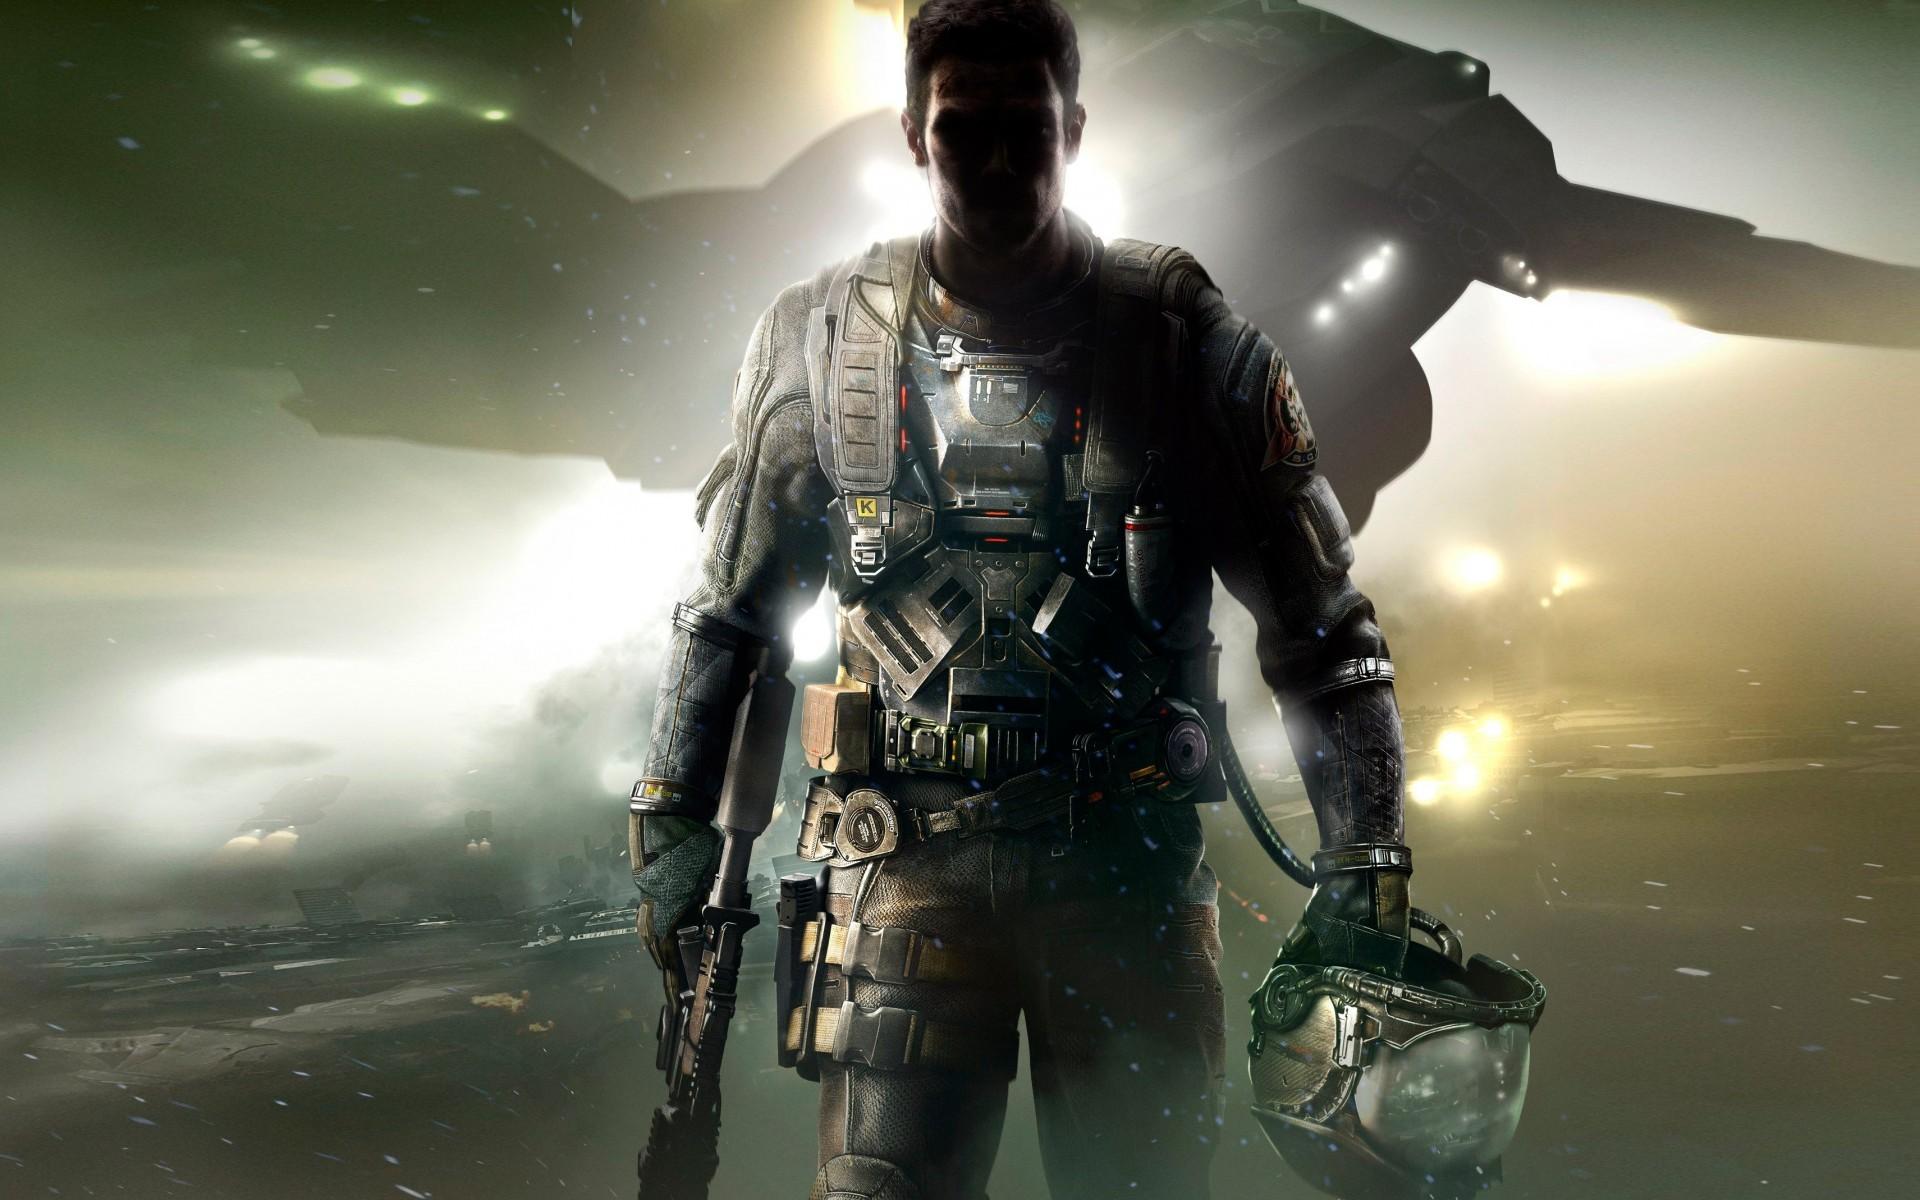 Games / Call of Duty: Infinite Warfare Wallpaper